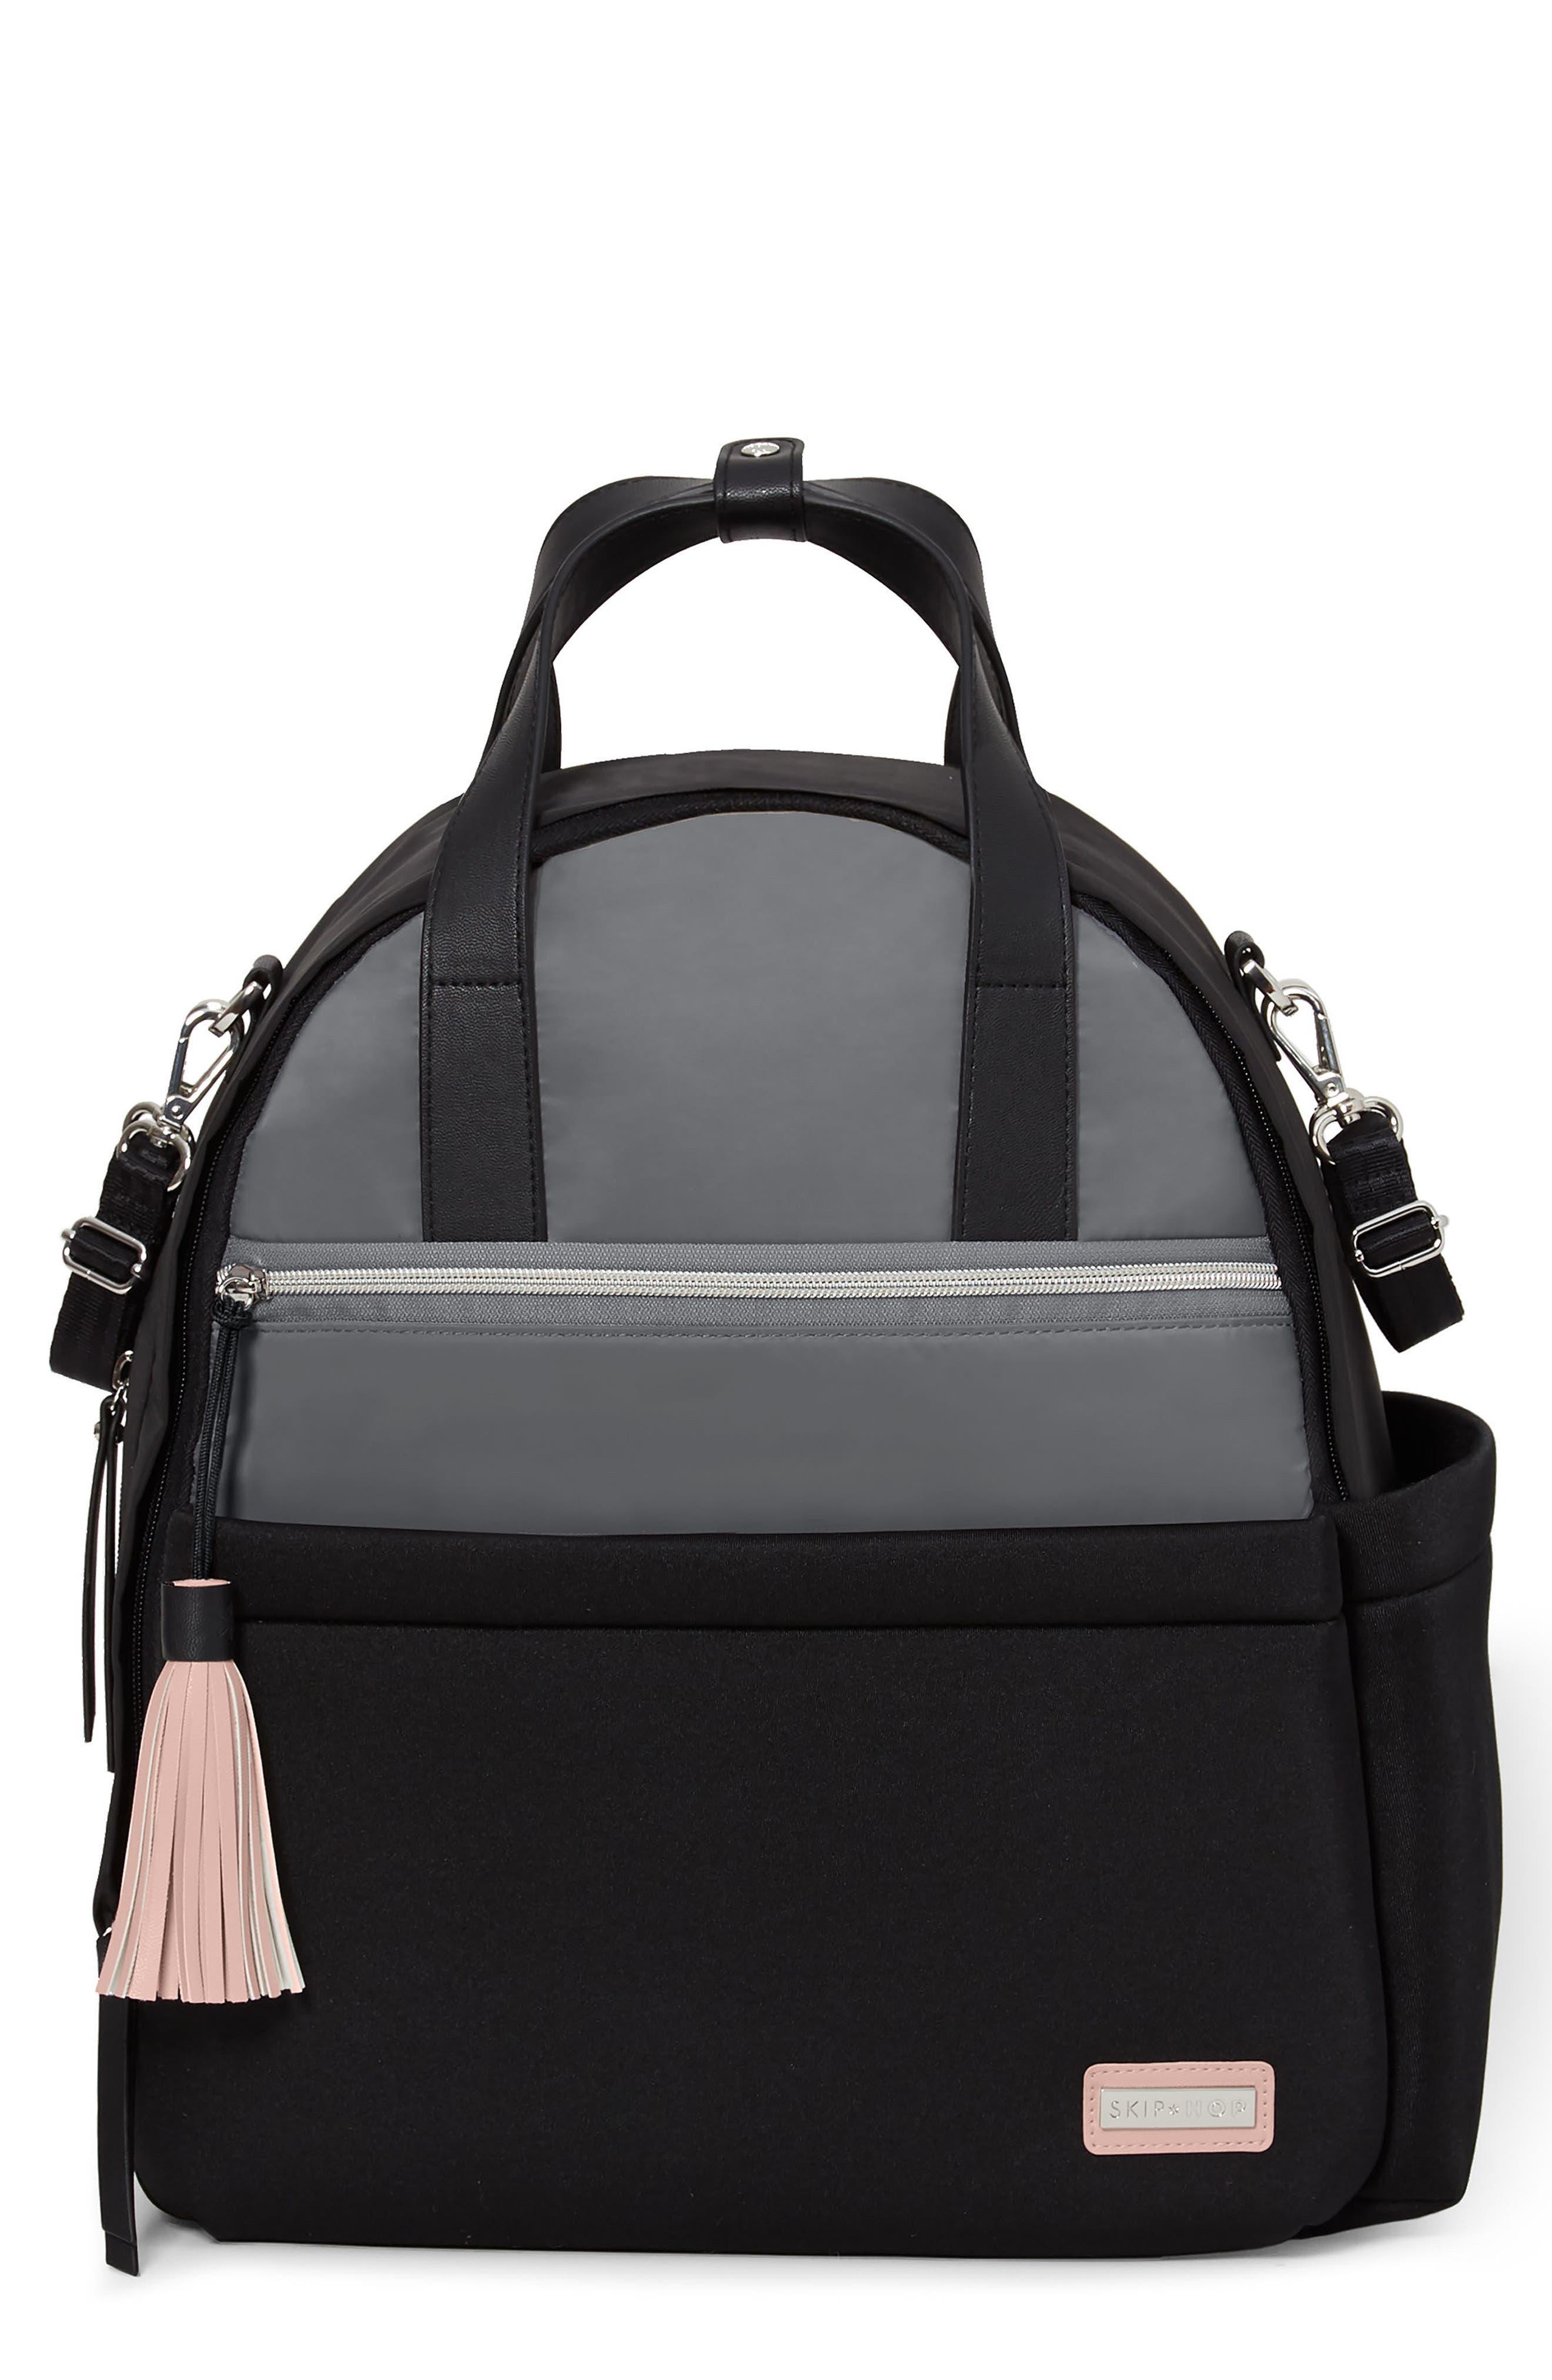 Alternate Image 1 Selected - Skip Hop Nolita Neoprene Diaper Backpack